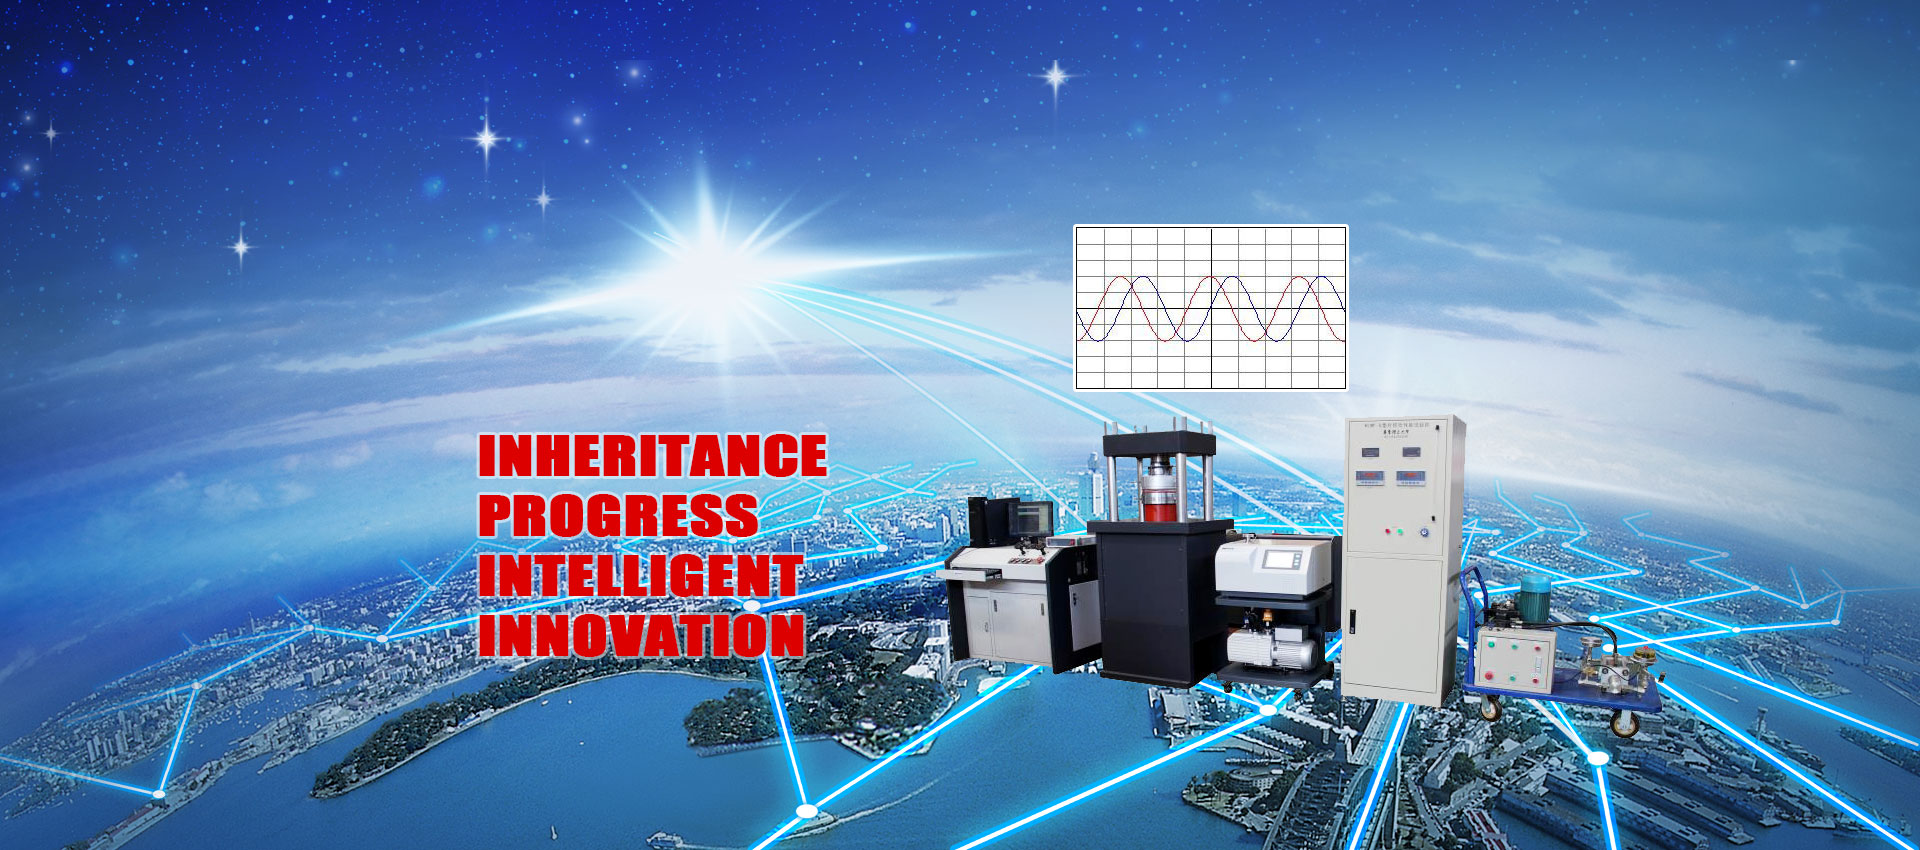 Inheritance and progress